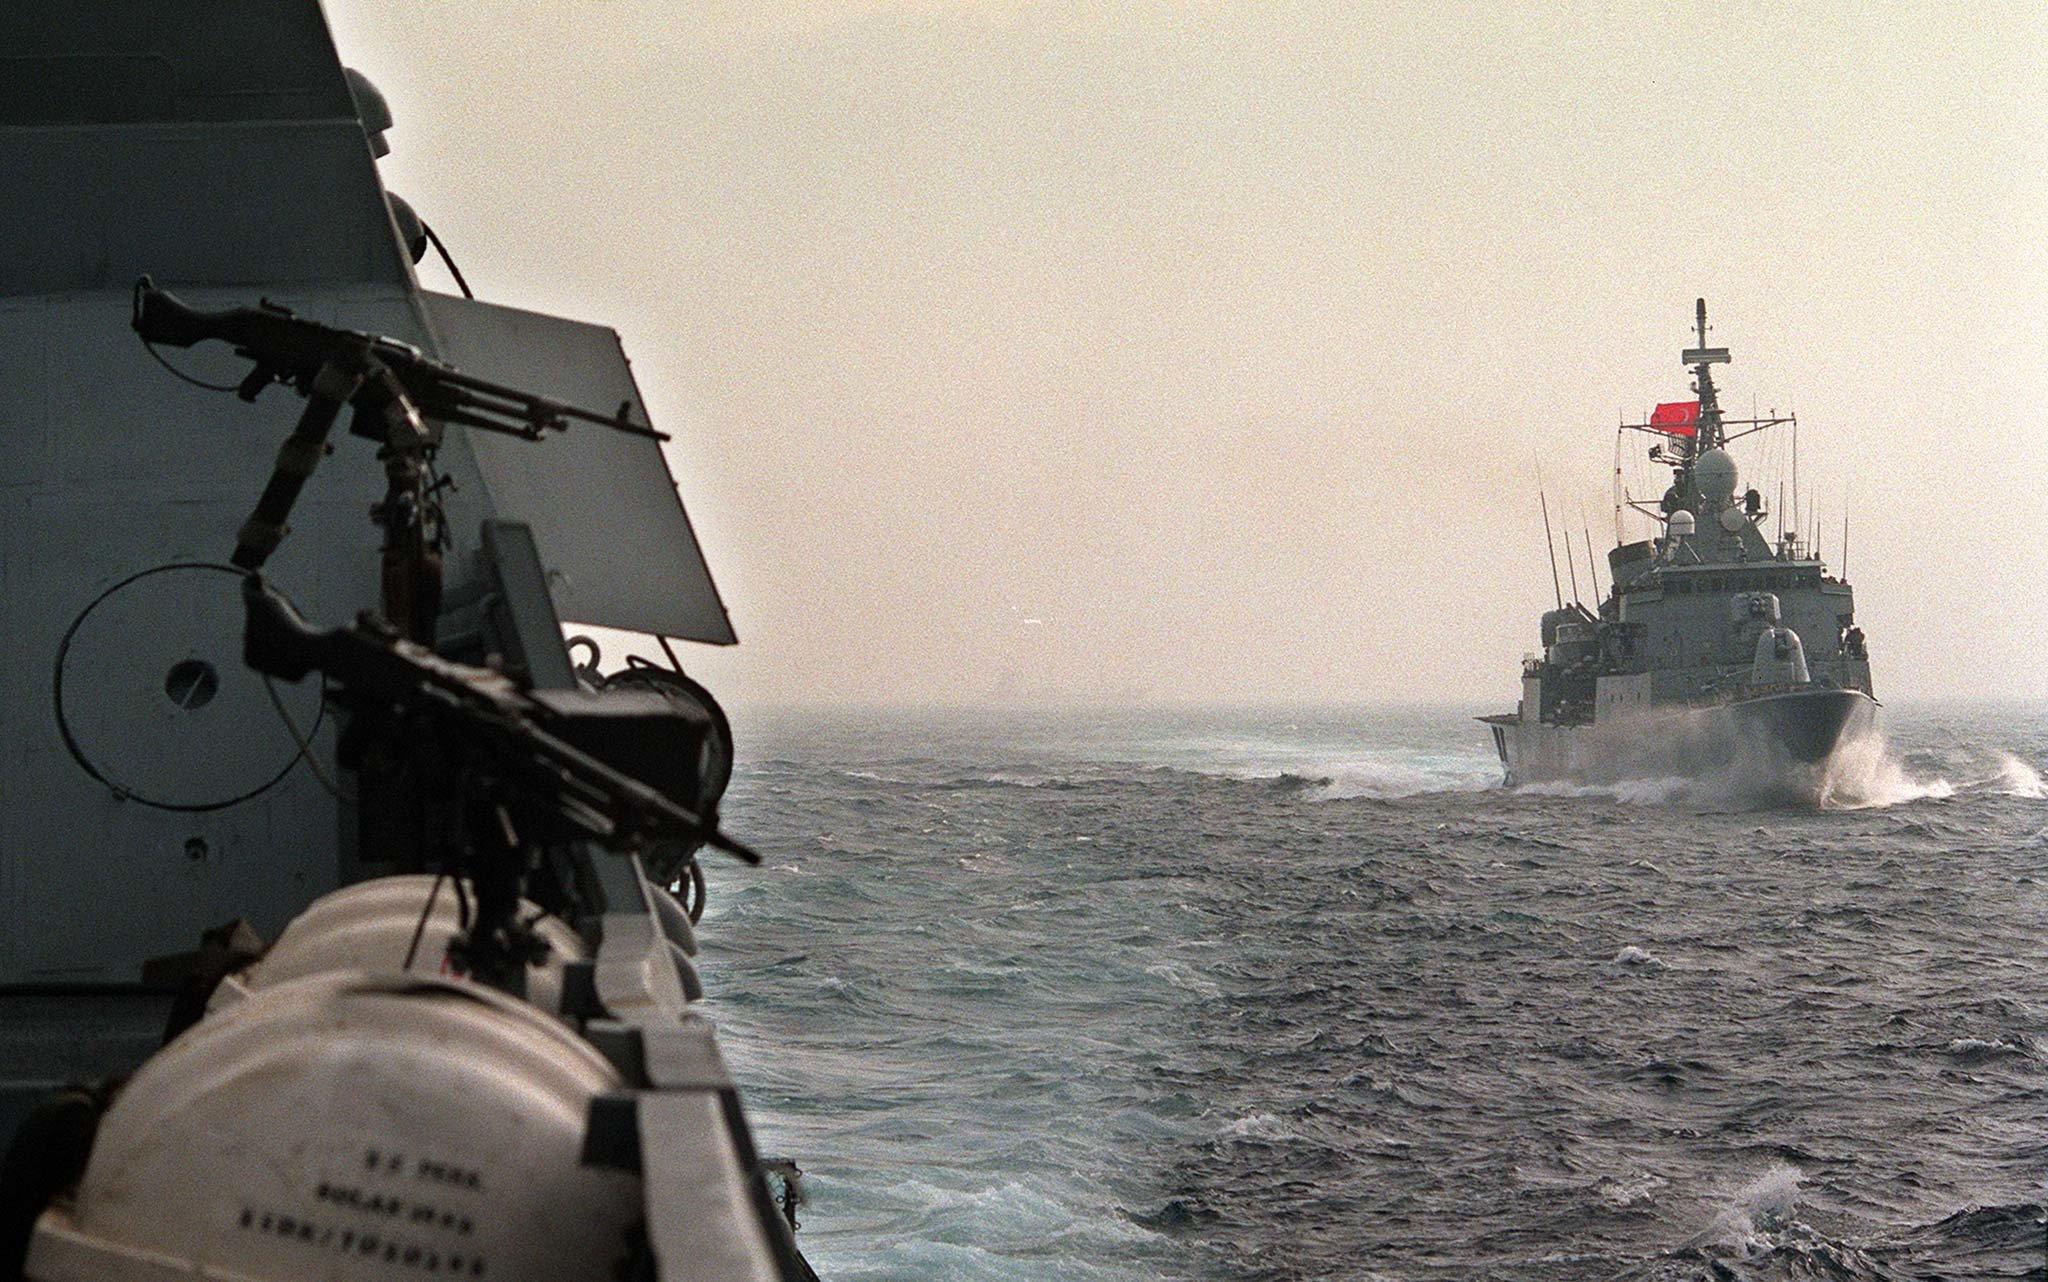 Yeni Safak: Τουρκικά σχέδια για κατασκευή ναυτικής βάσης στα